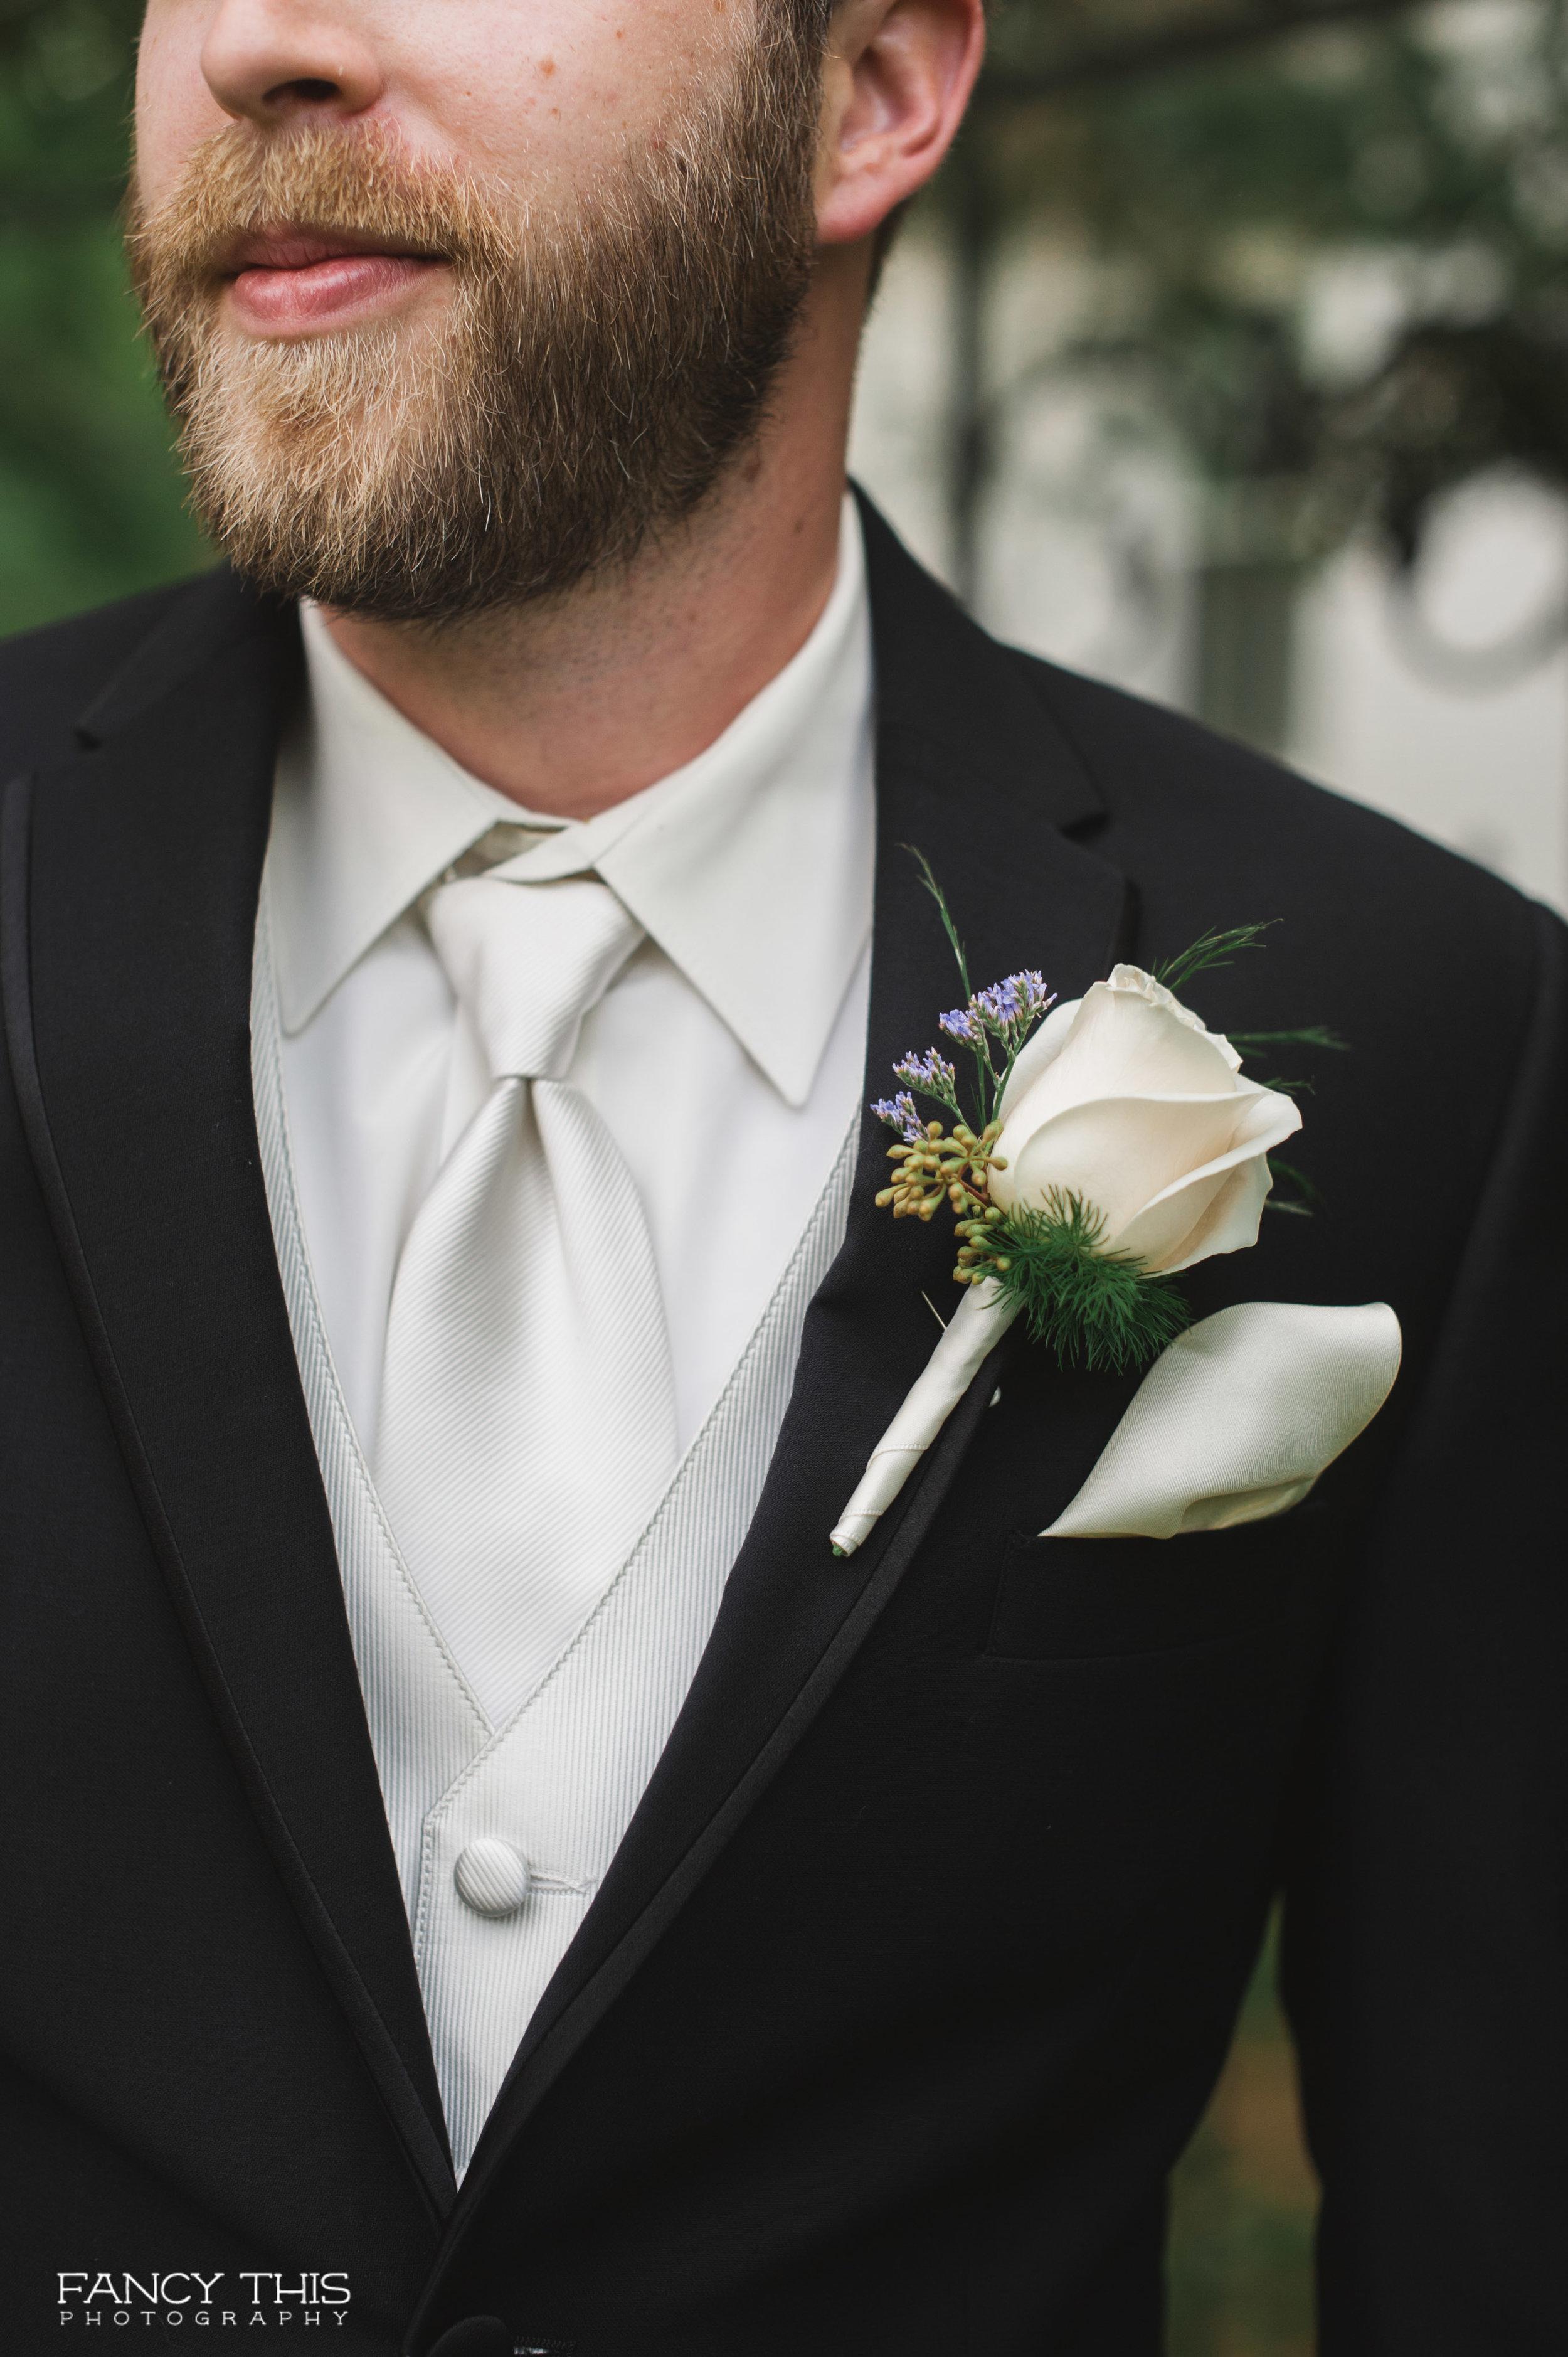 courtneyjasonwedding_socialmediaready037.jpg